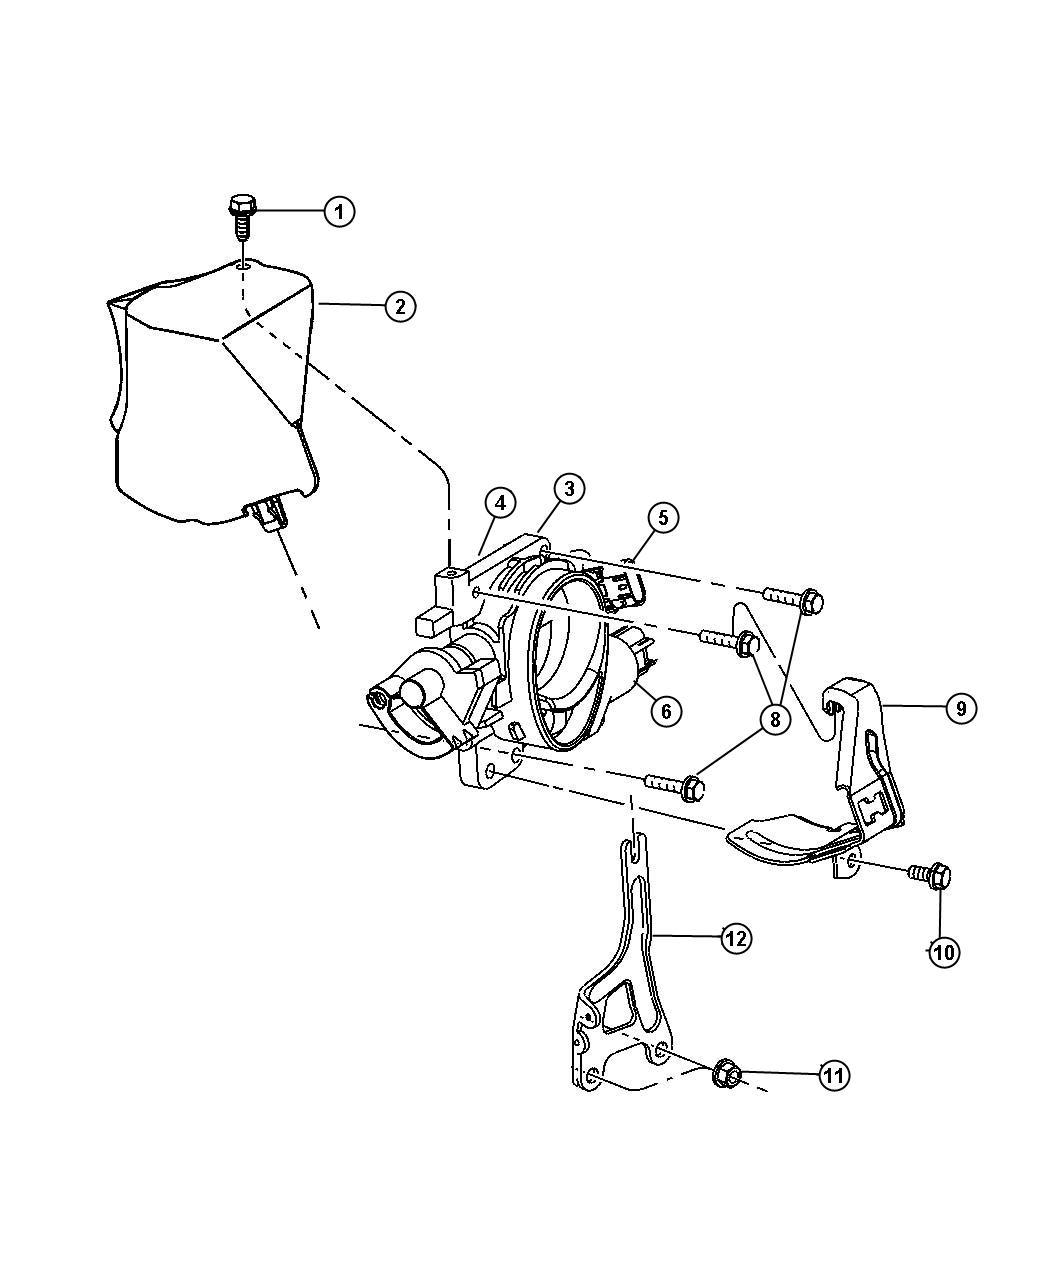 Chrysler Sebring Screw 6 Lobe Throttle Cable To Support